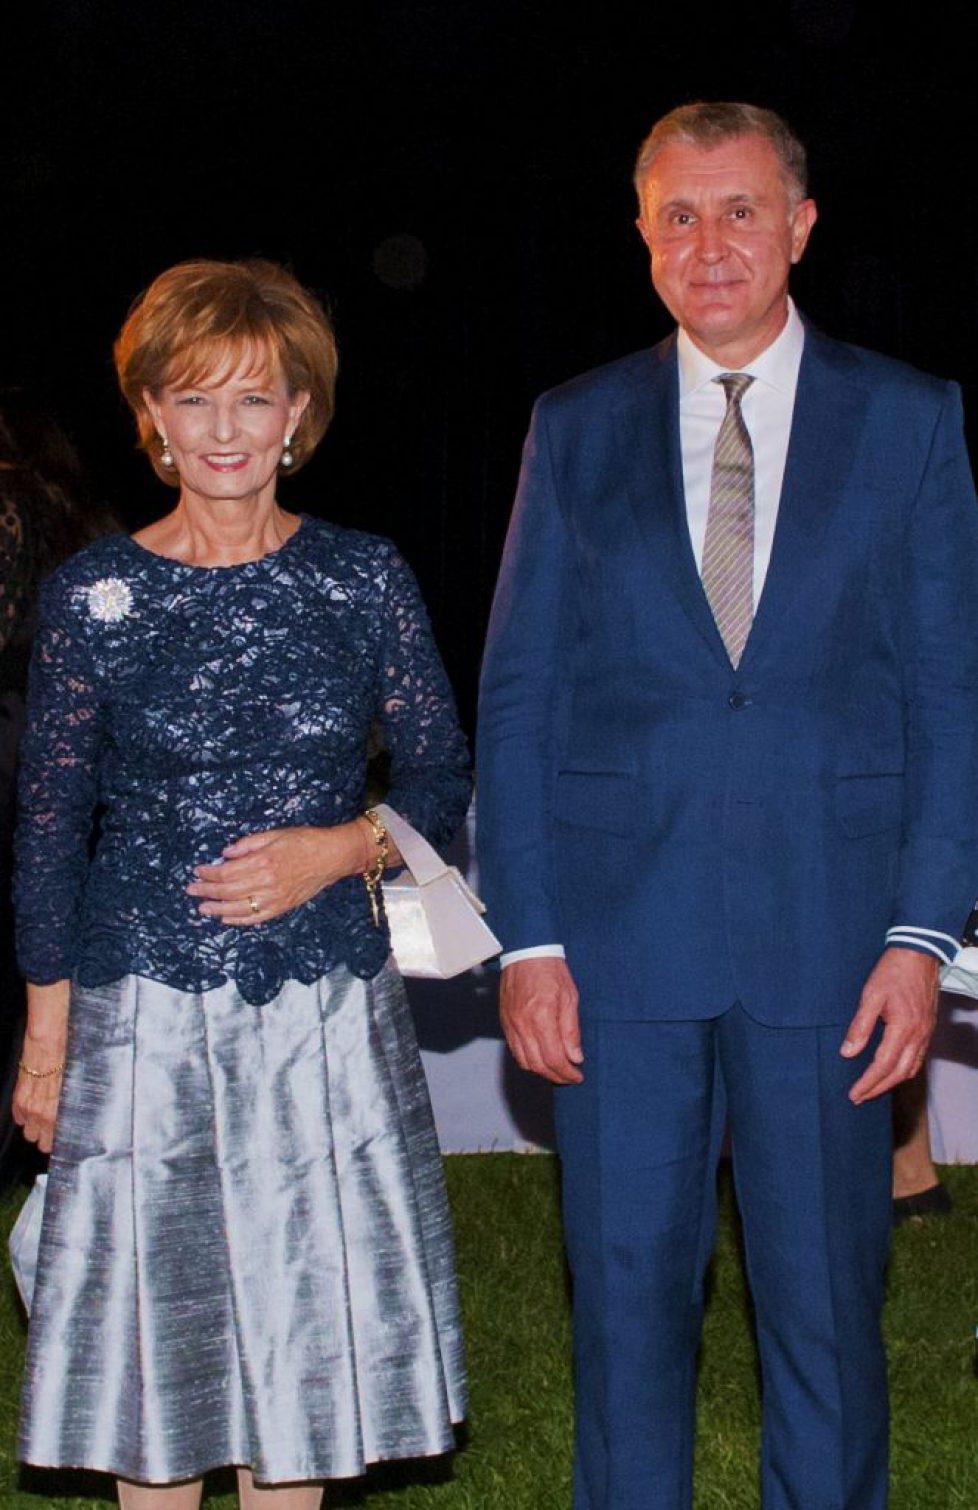 2021927-Seara-PE-Nunta-de-Argint-Majestatea-Sa-Margareta-Custodele-Coroanei-Principele-Radu_ANG0844